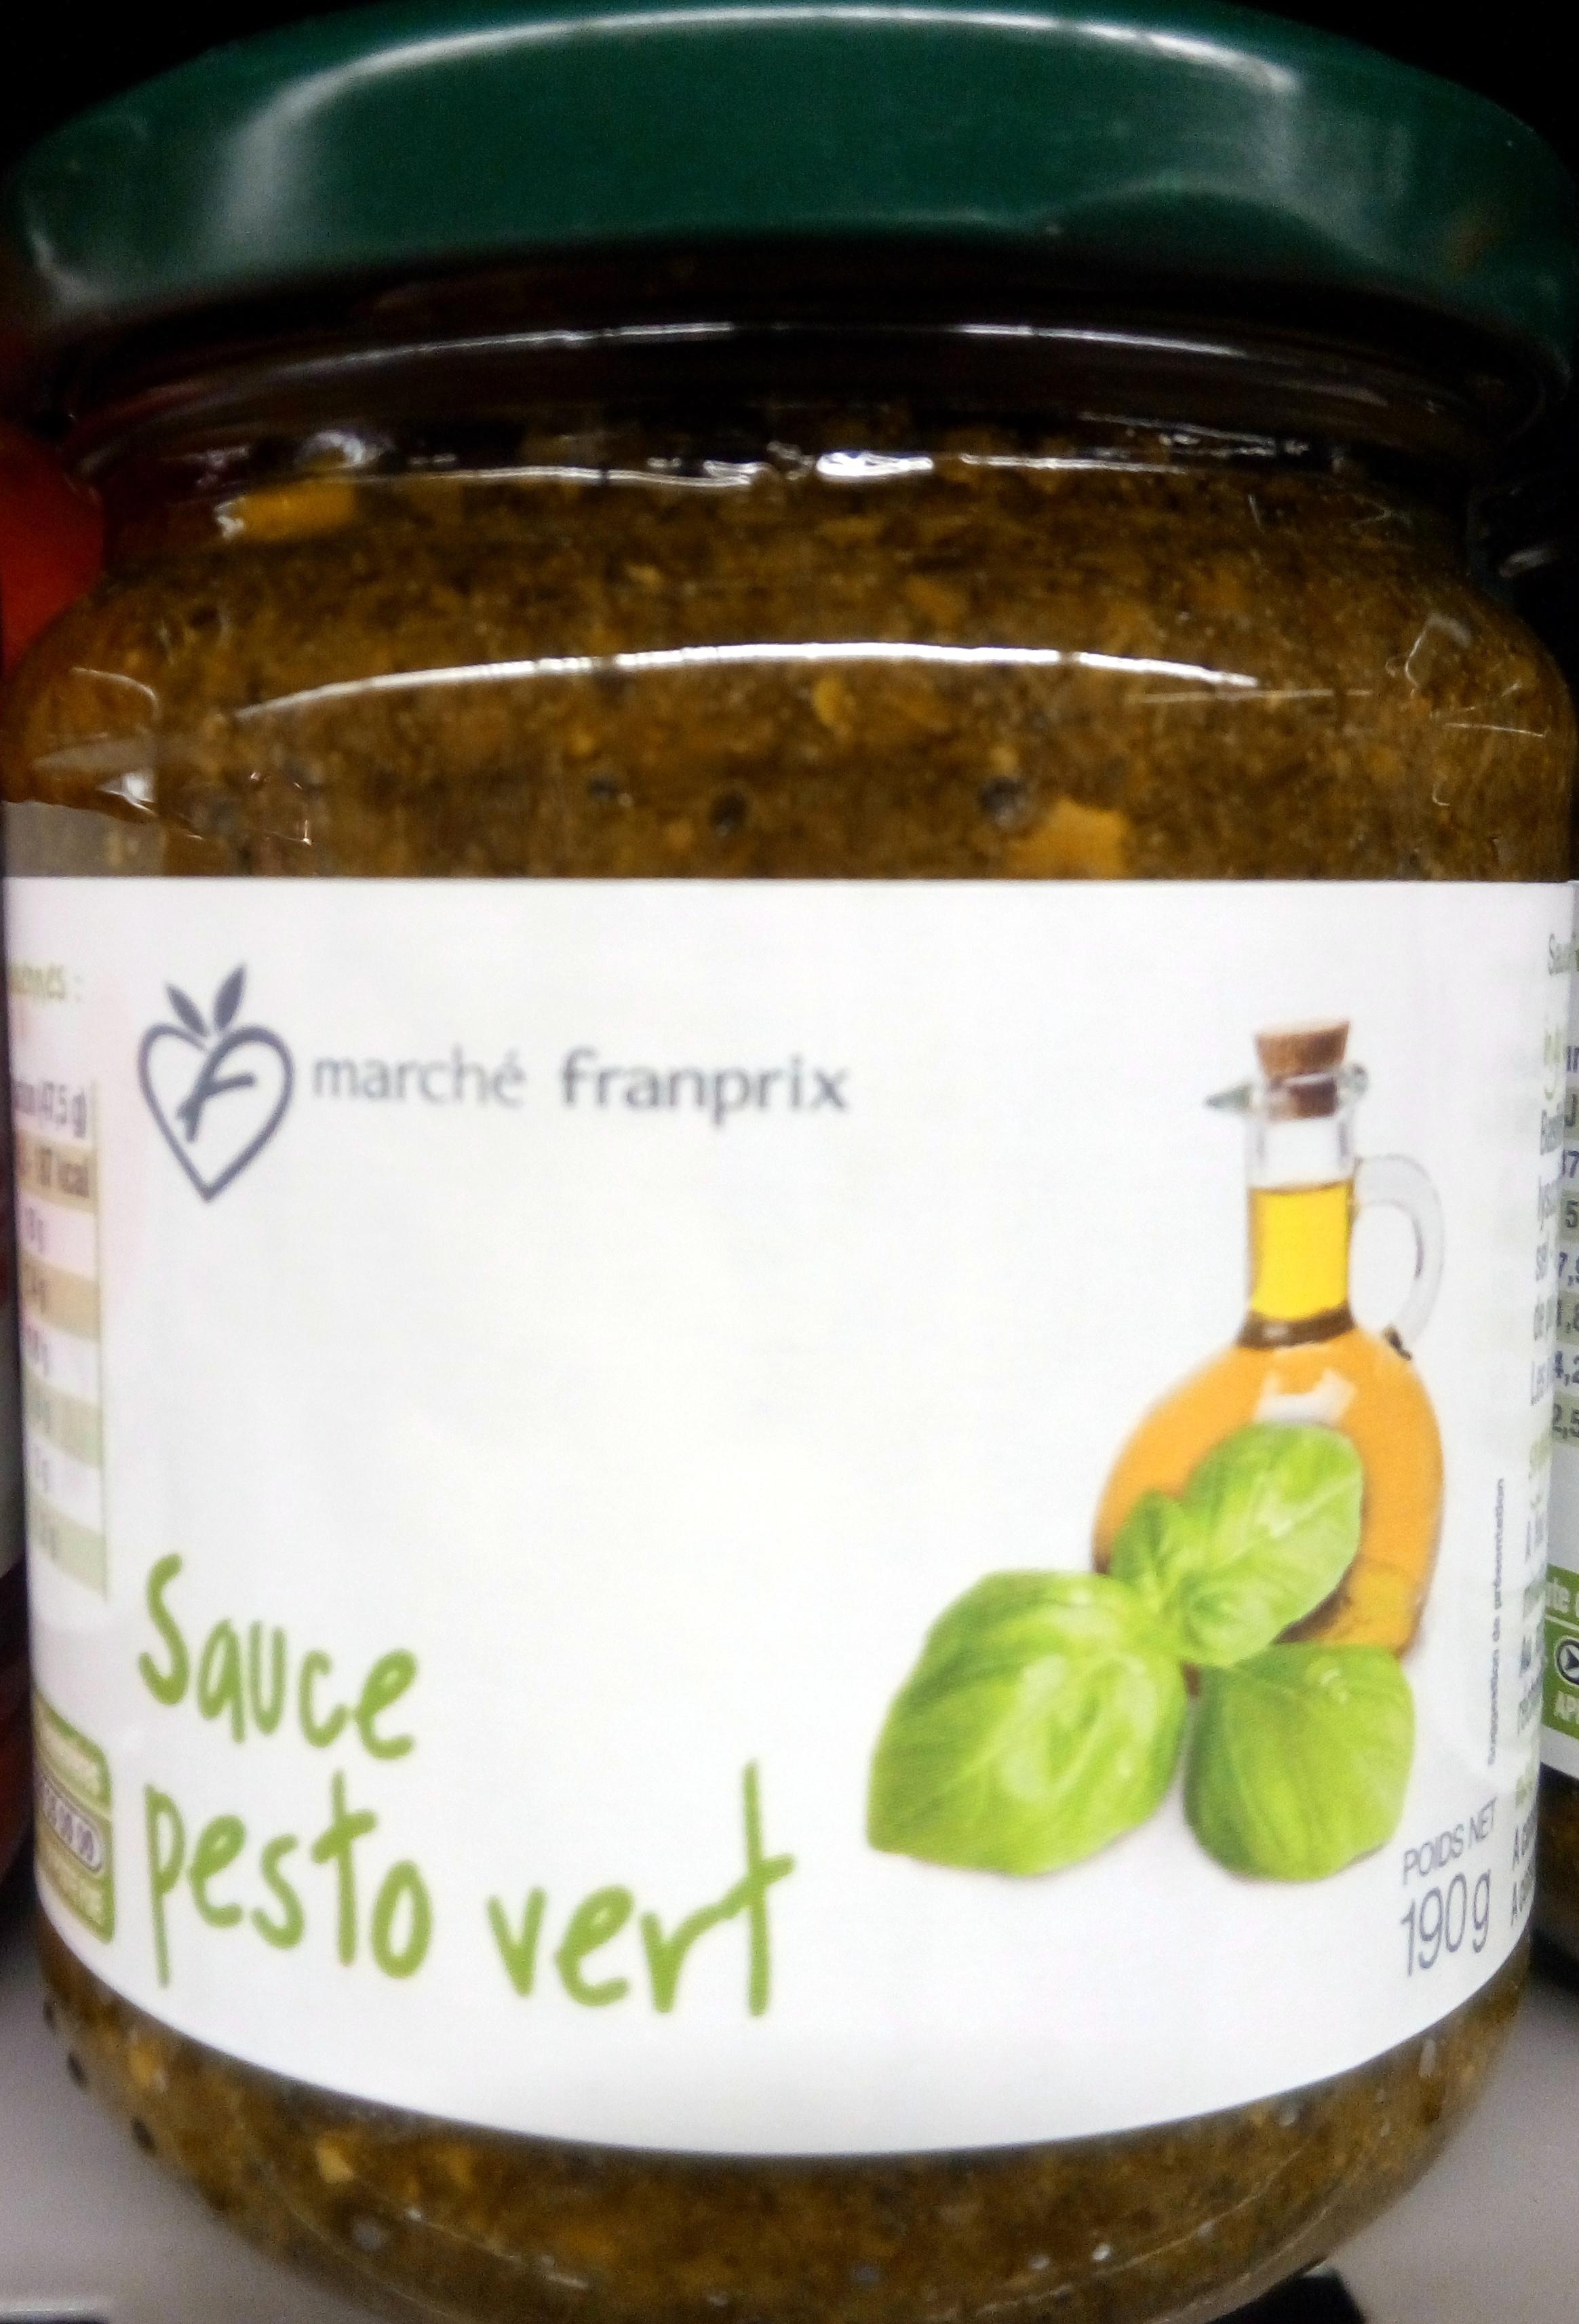 Sauce pesto vert - Product - fr